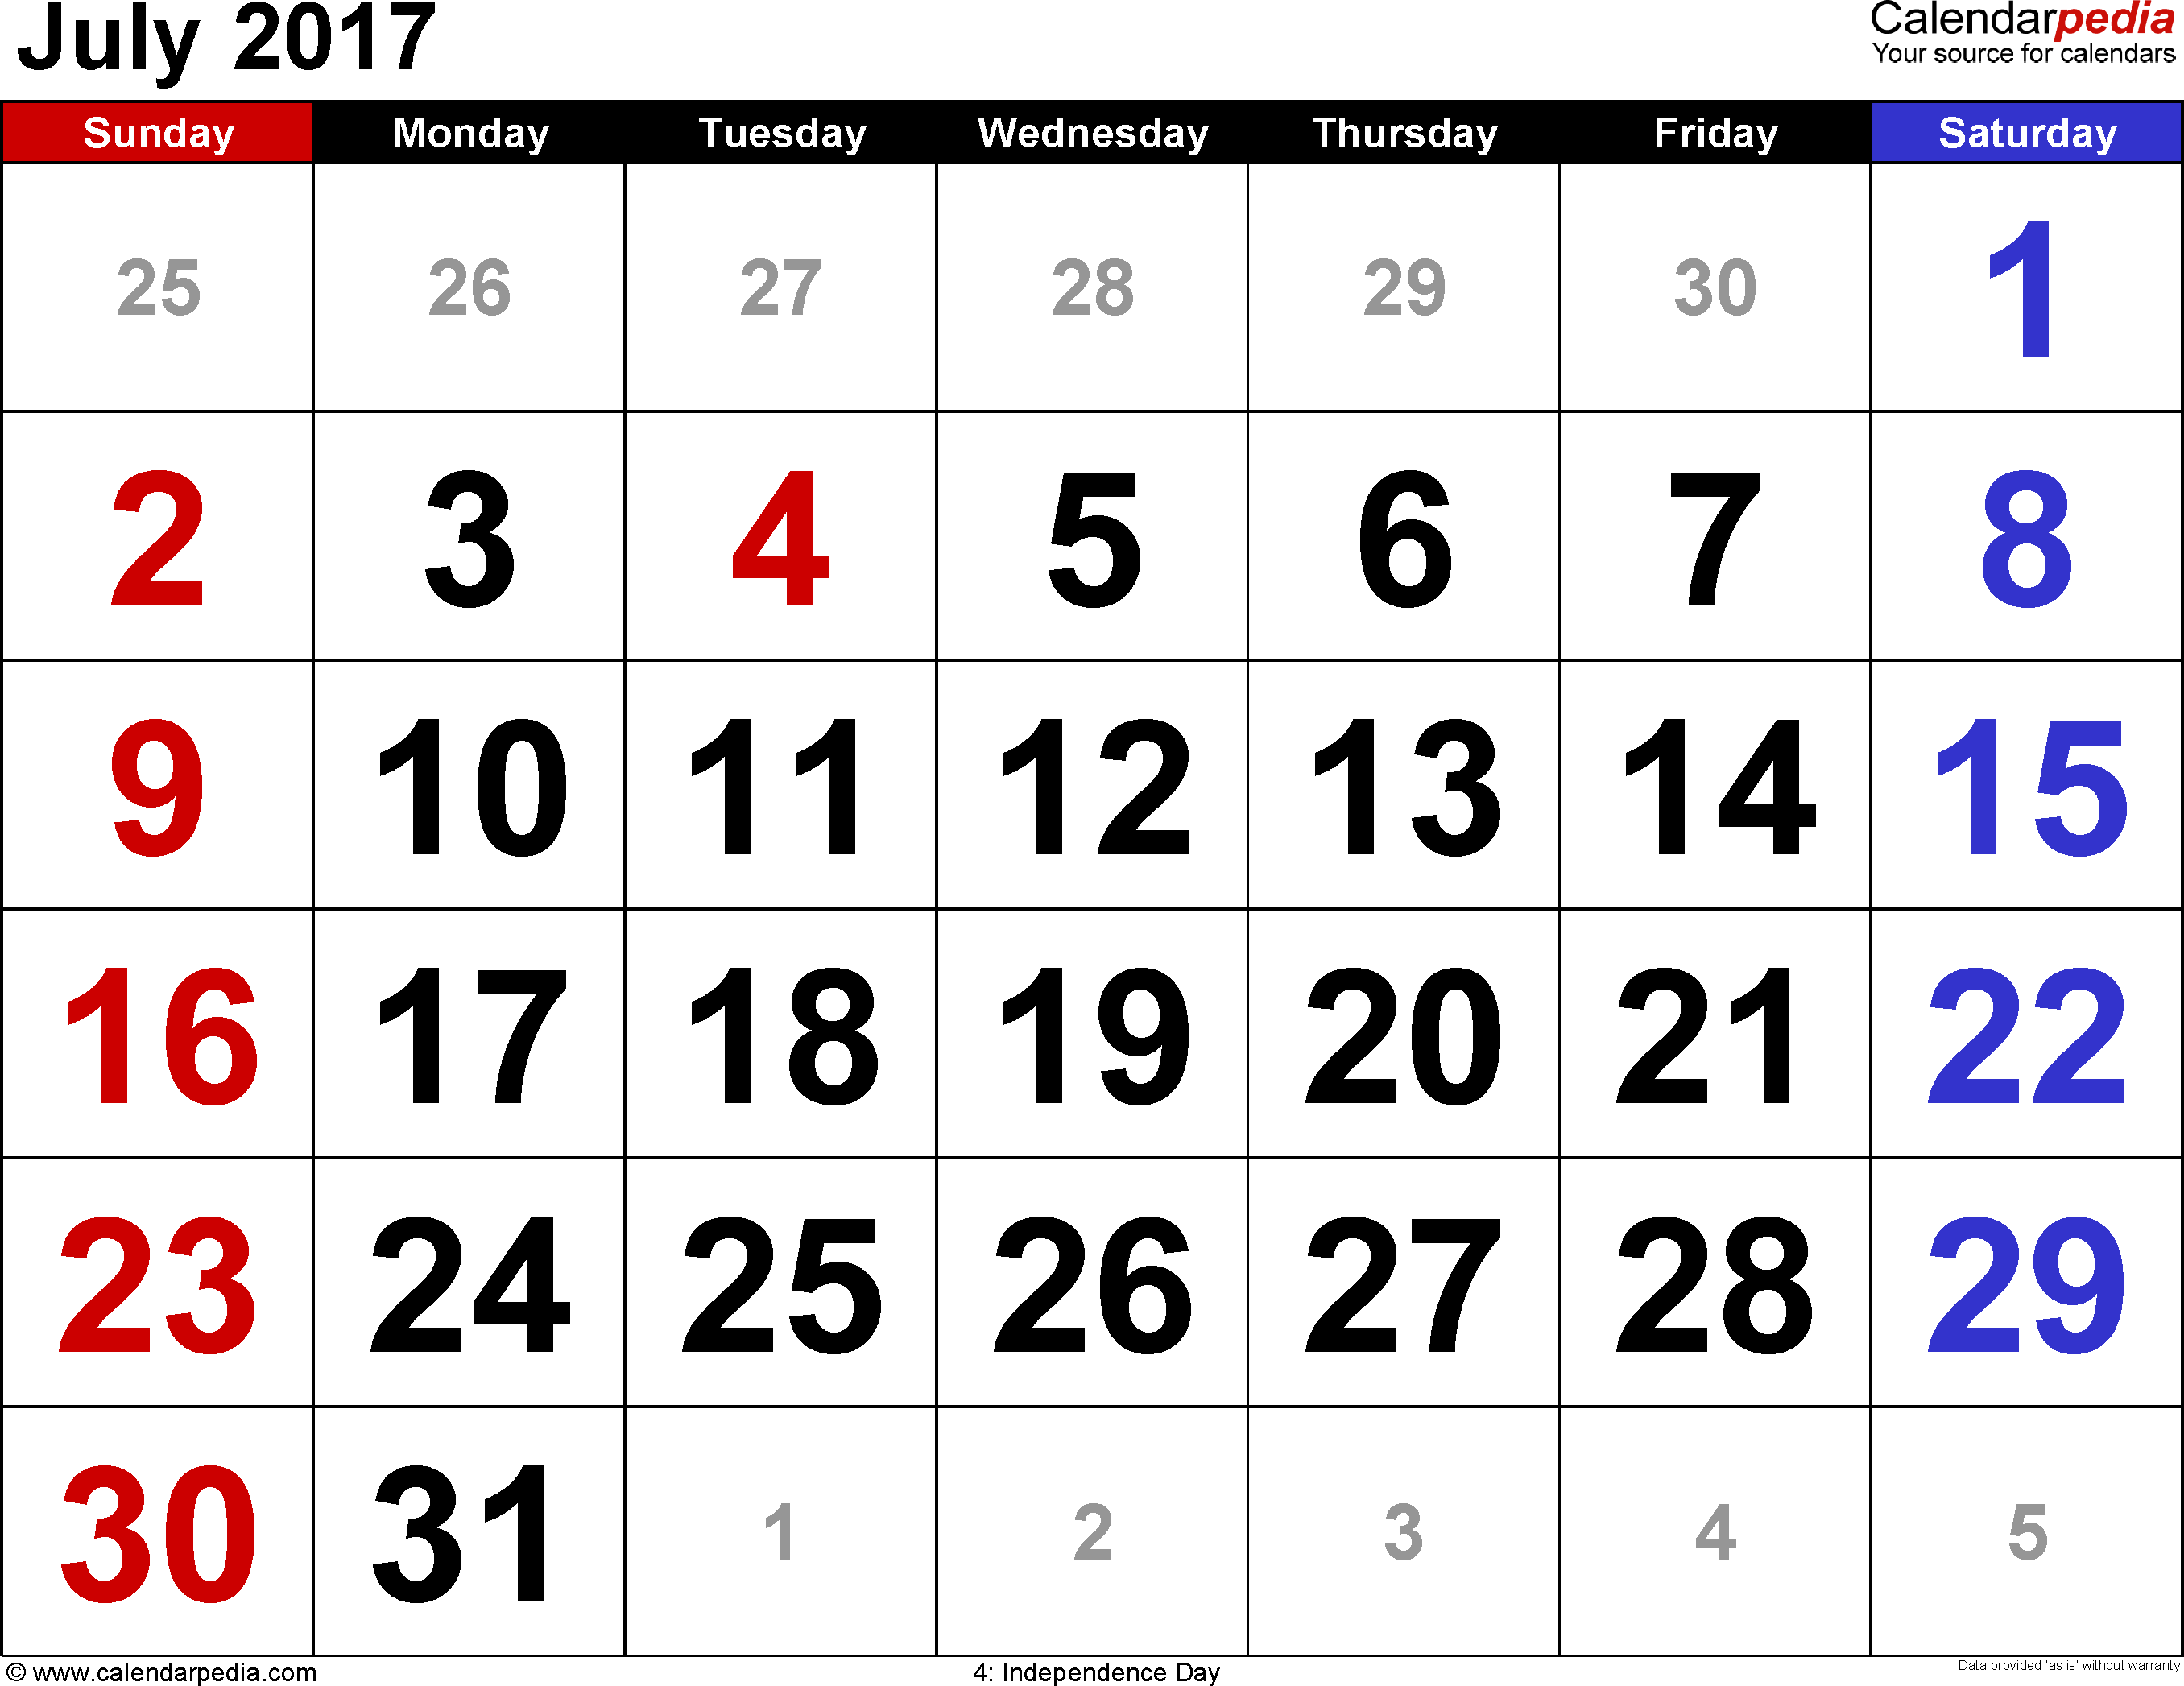 July 2017 Calendar Page | July 2017 Calendar | October